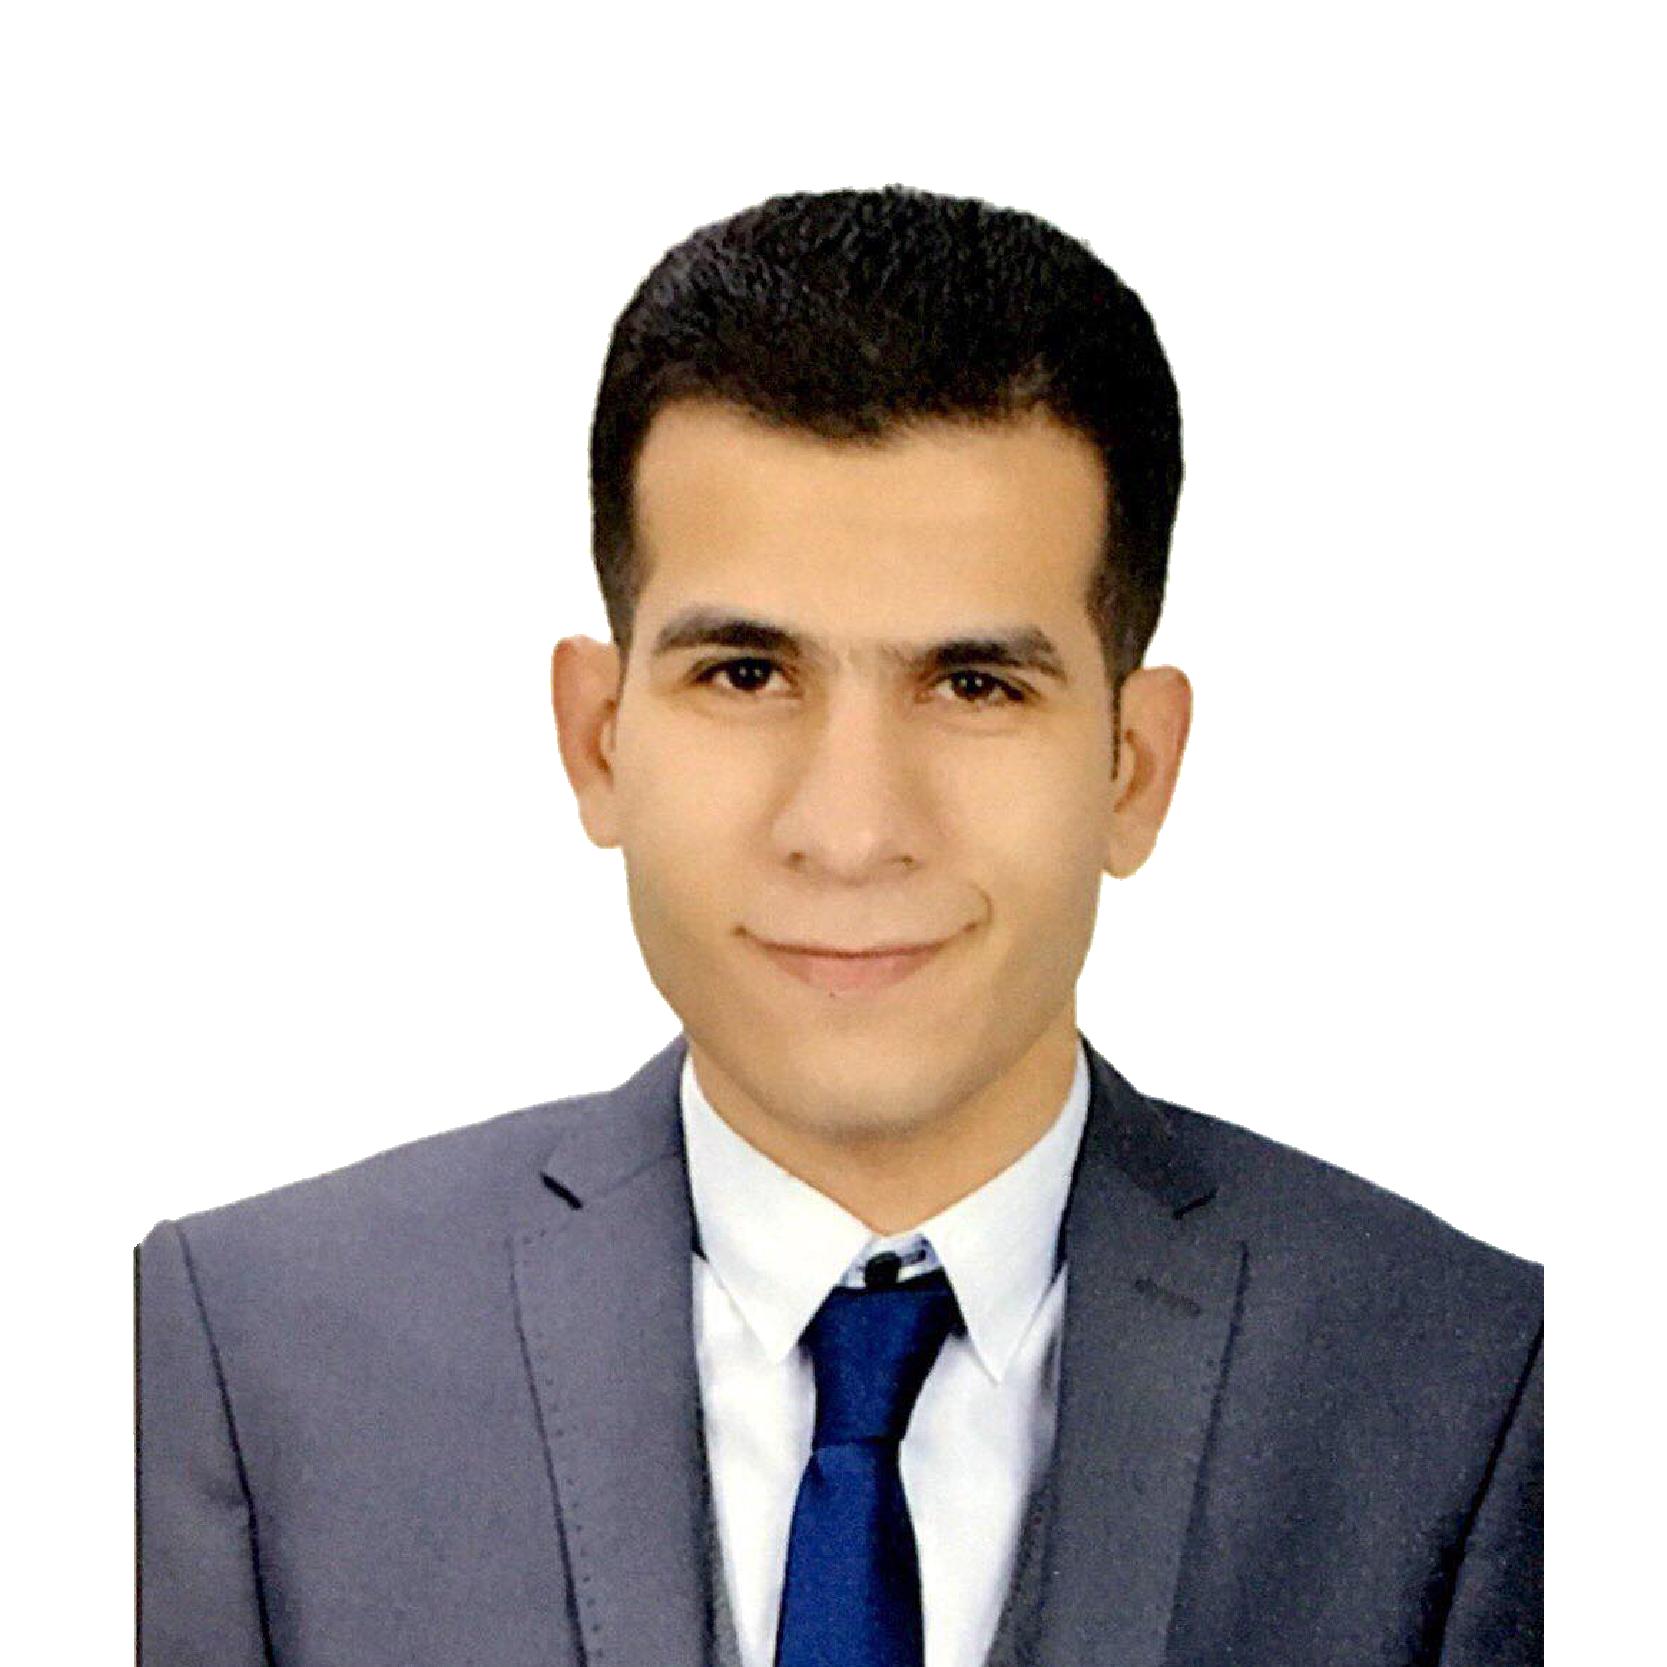 Ahmed Sami